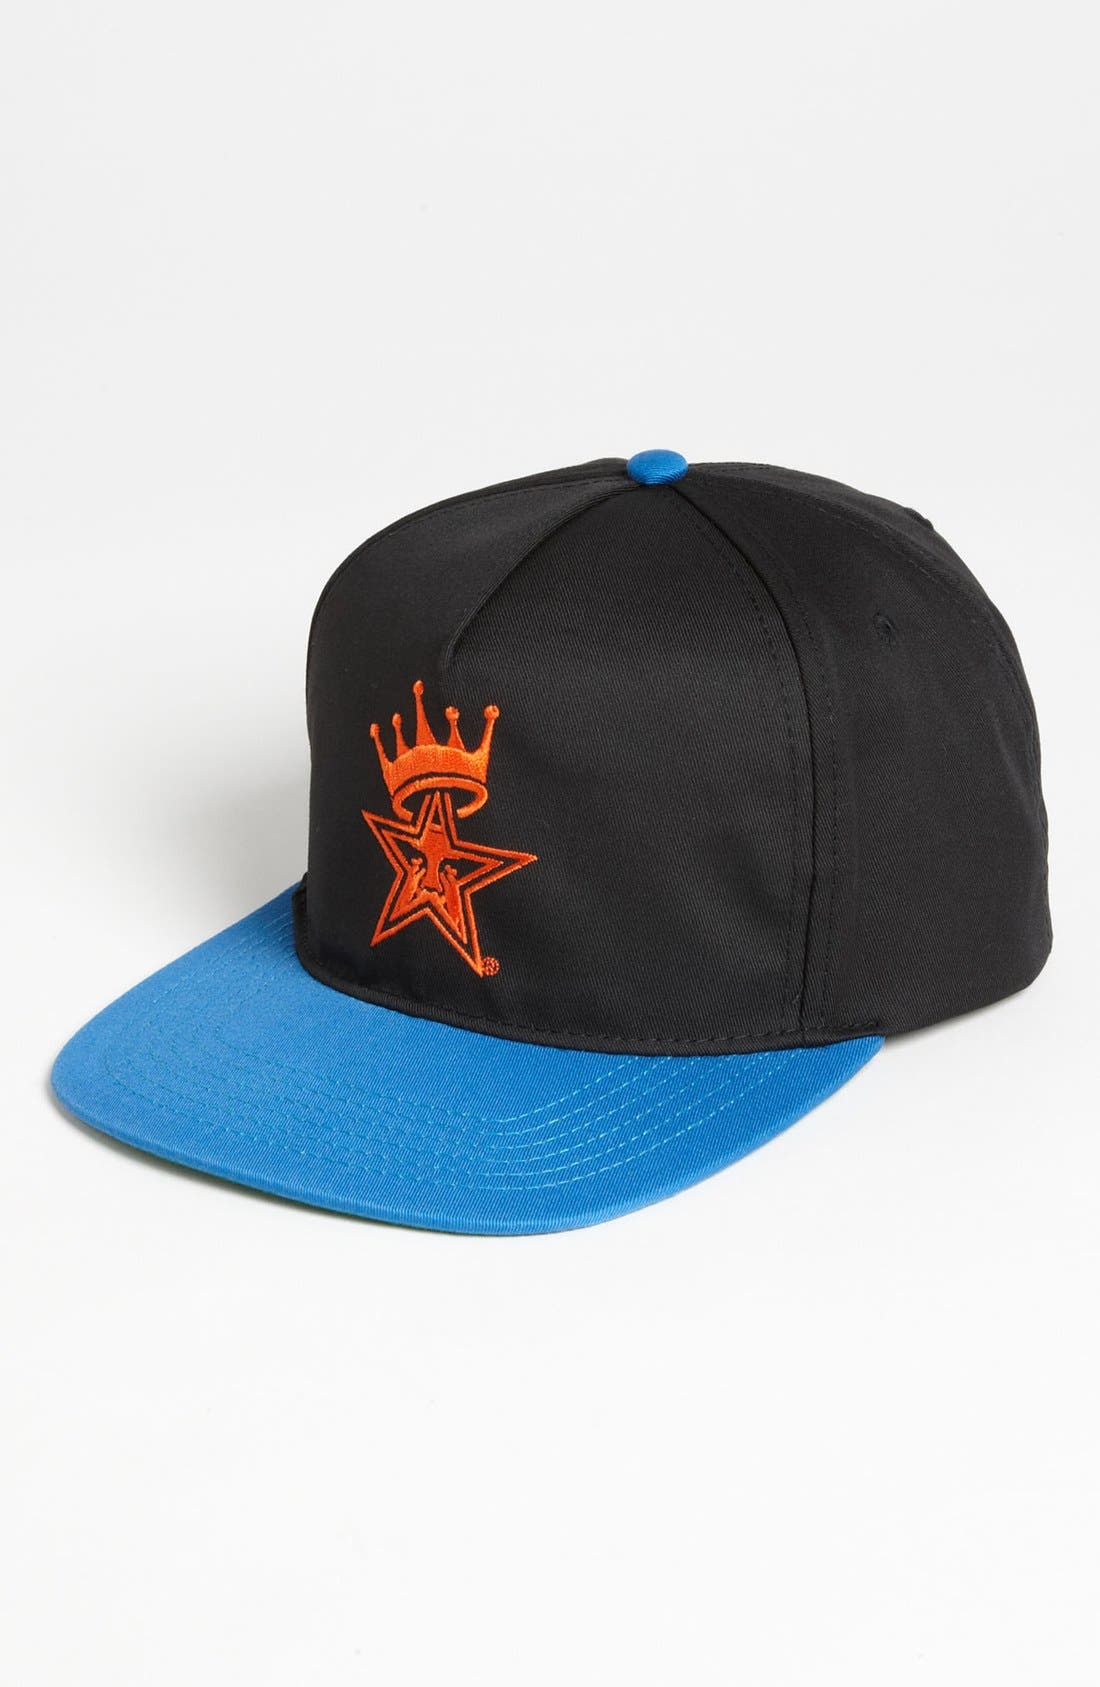 Alternate Image 1 Selected - Obey 'Foul Line' Snapback Hat